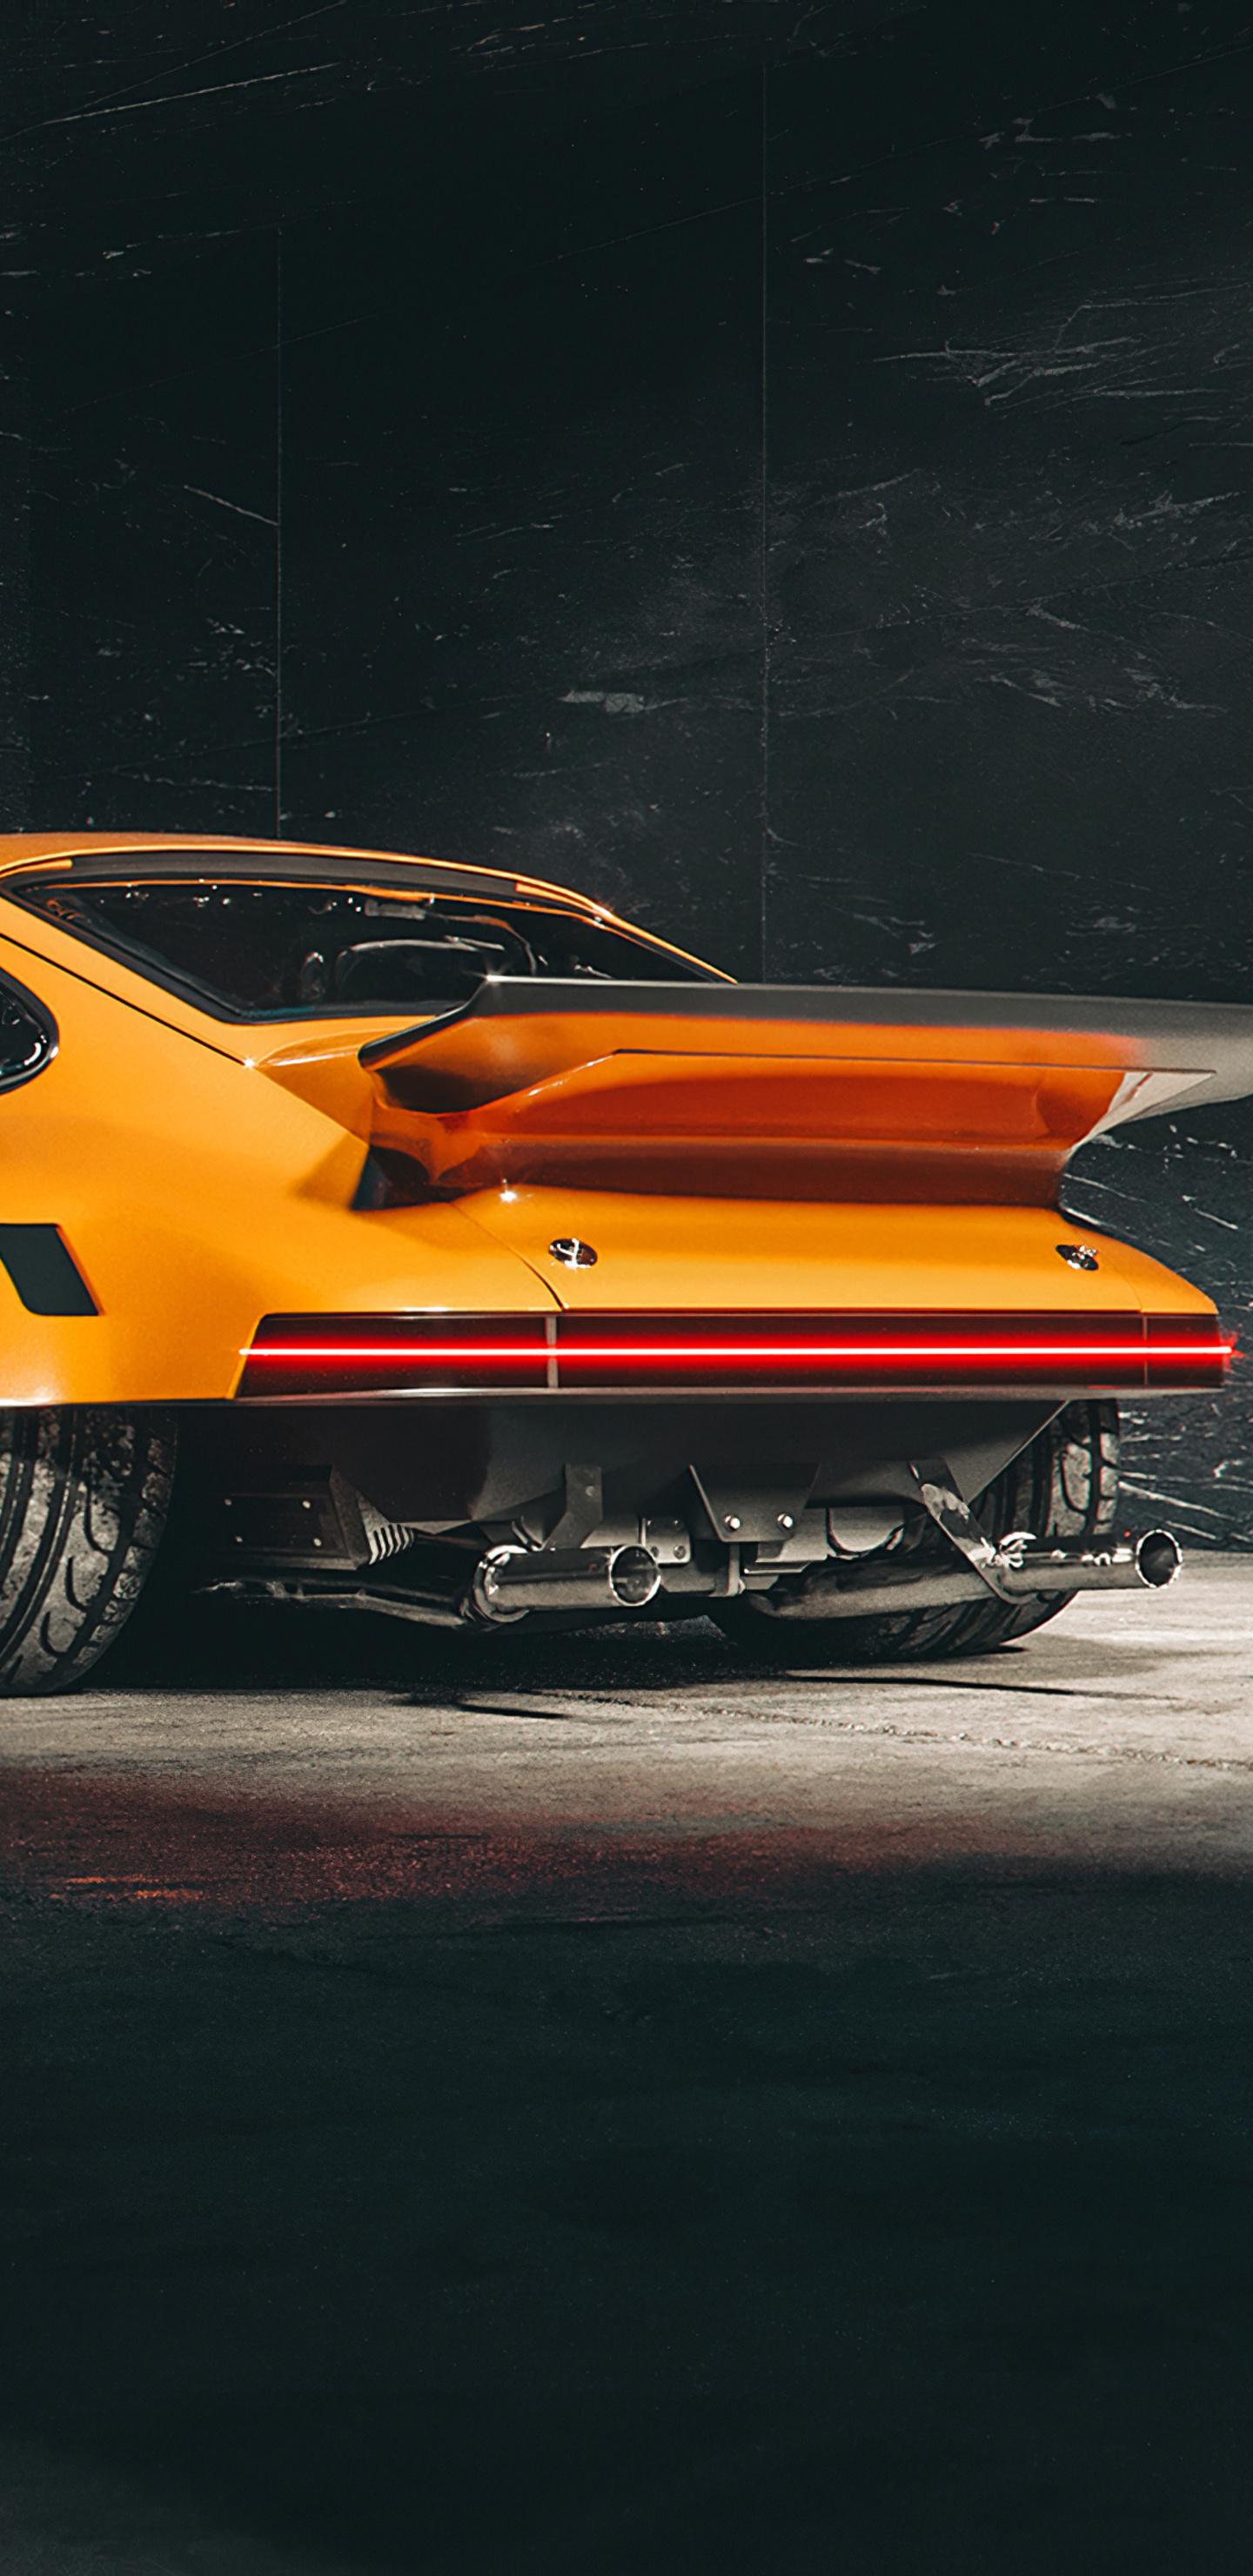 porsche-911-modified-custom-4k-pm.jpg